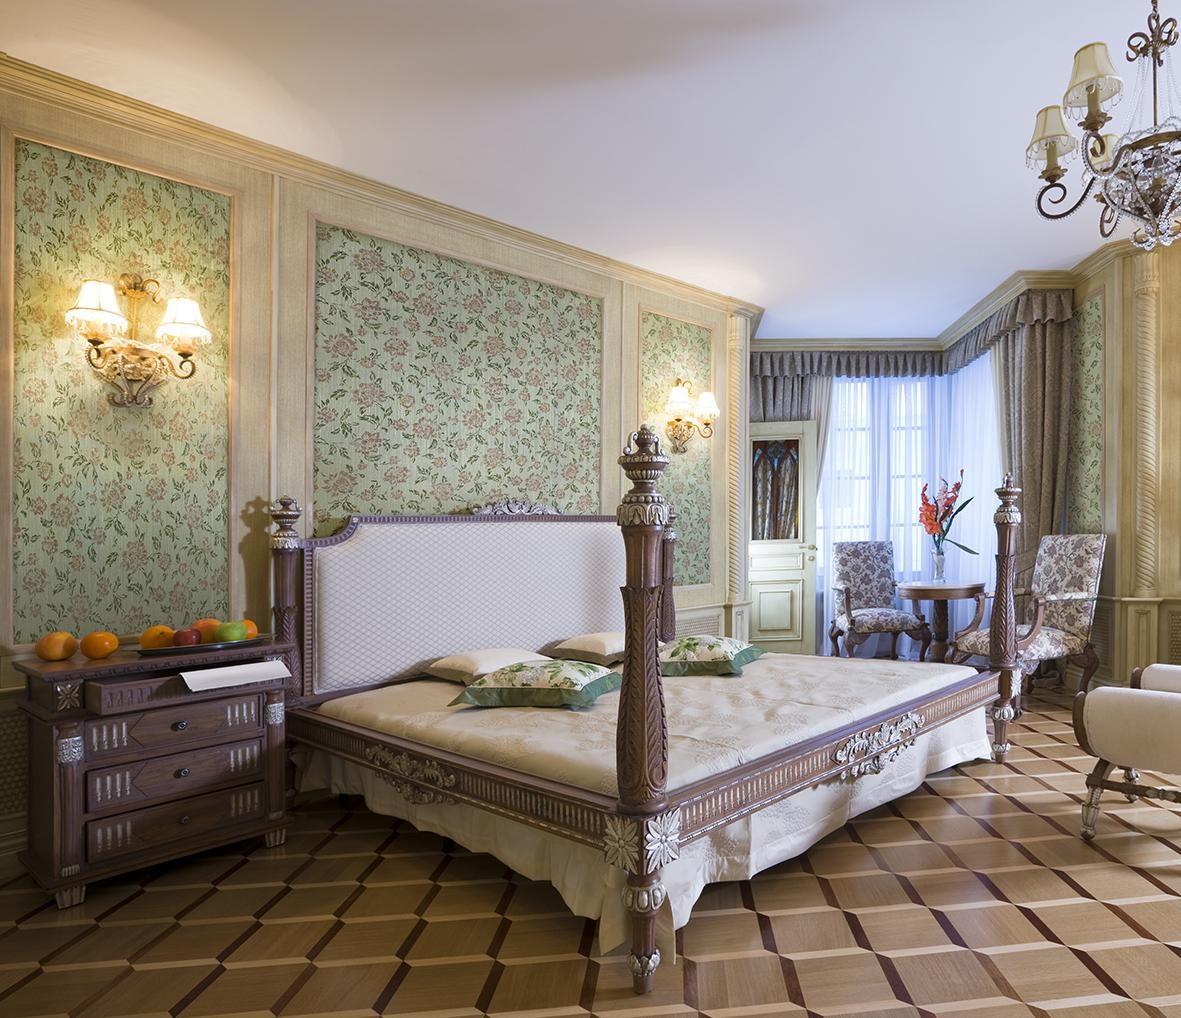 Интерьер спальни во французском стиле фото